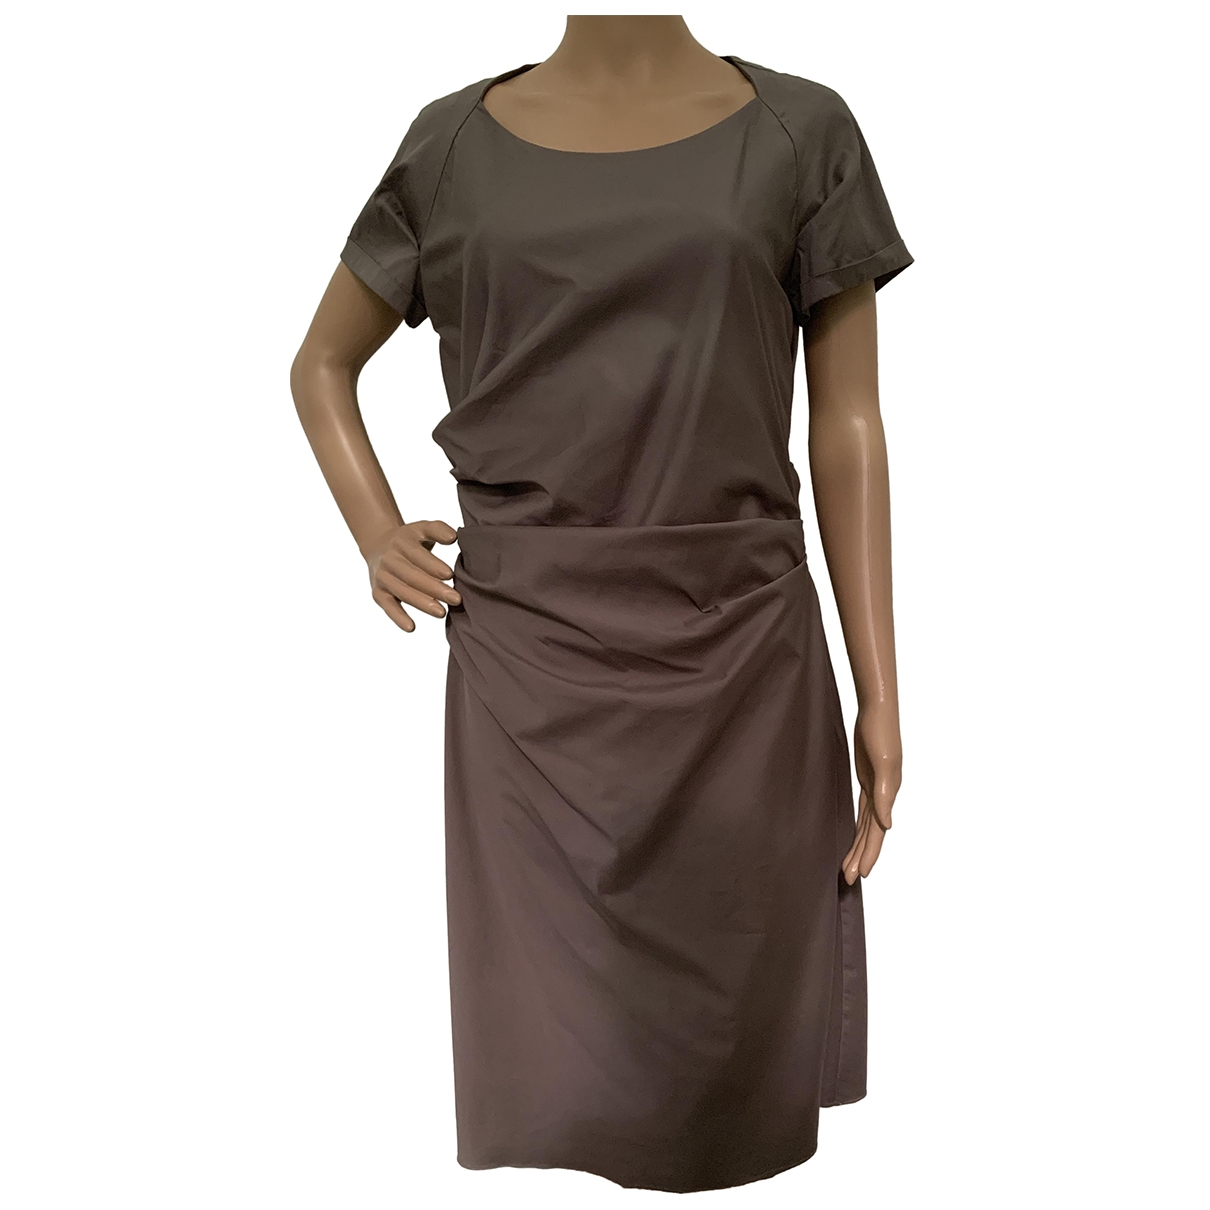 Windsor - Robe   pour femme en coton - elasthane